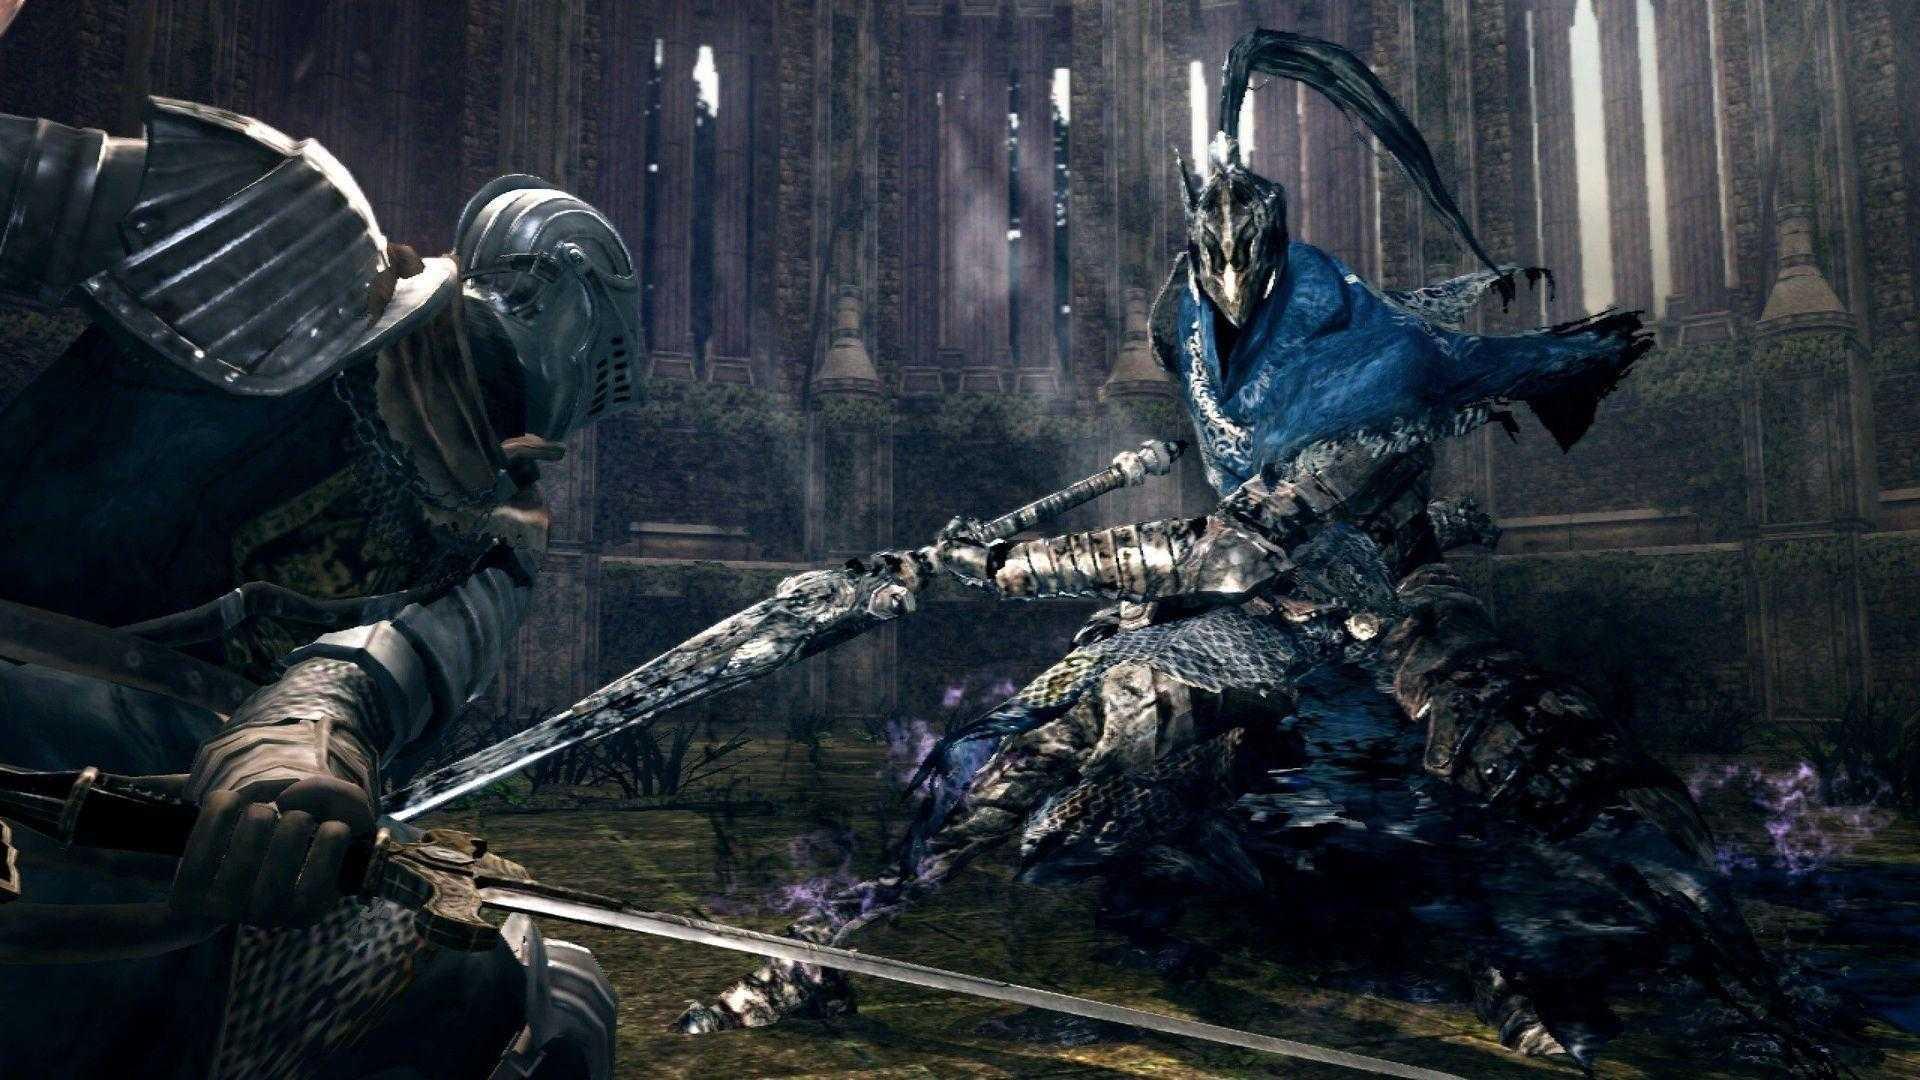 Dark Souls 3 Artorias 75144 Hd Wallpaper Backgrounds